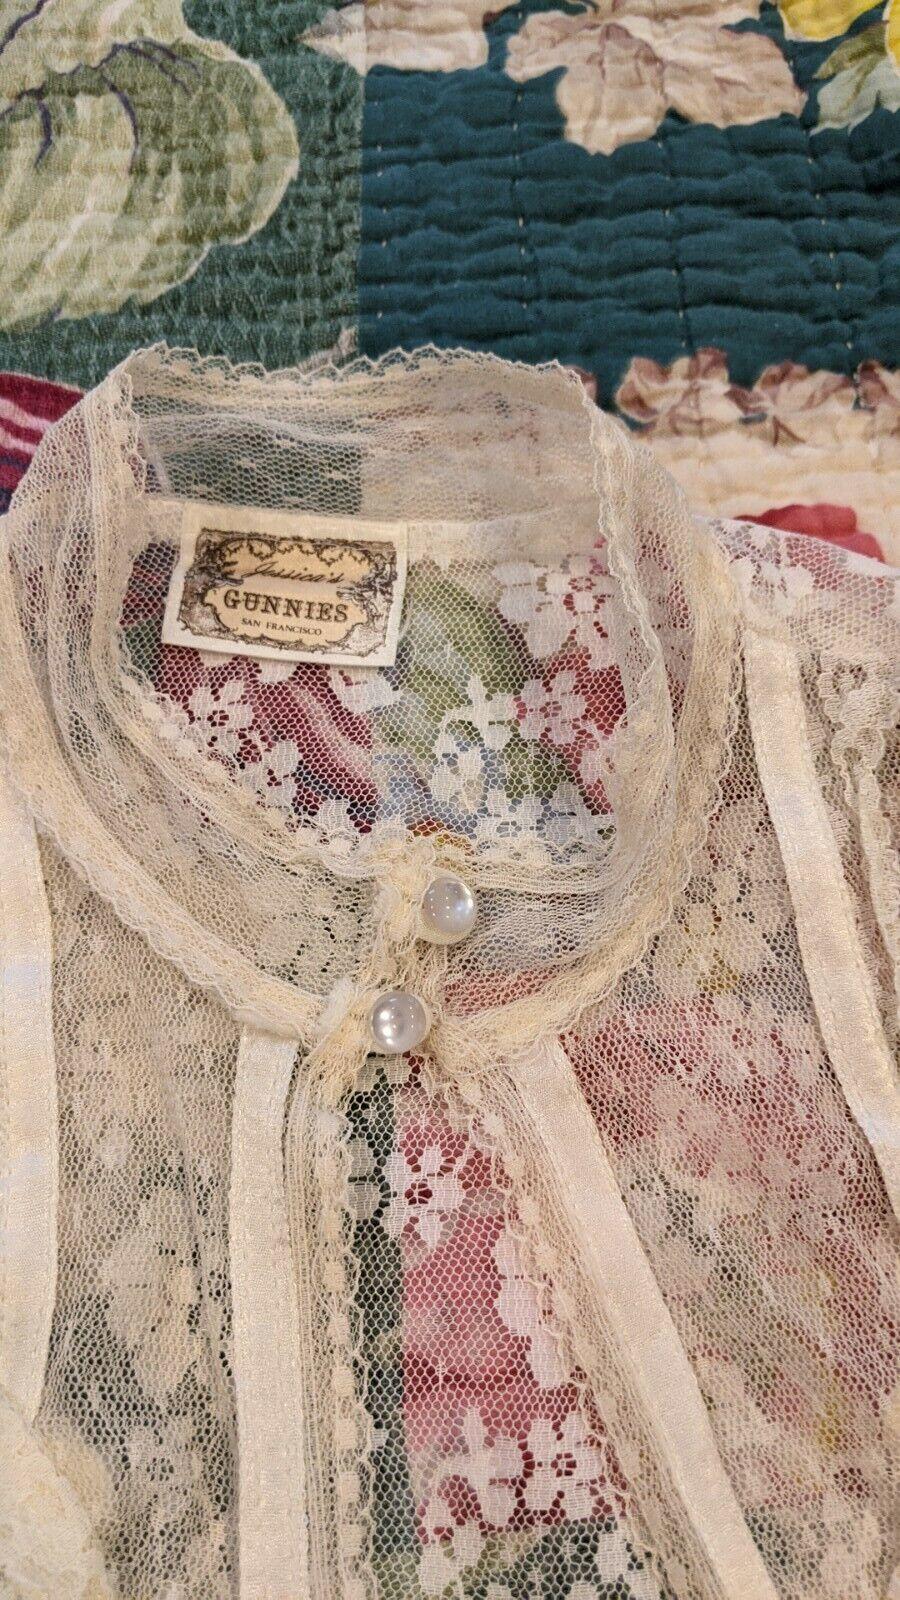 Gunne Sax vintage lace Jacket - image 2